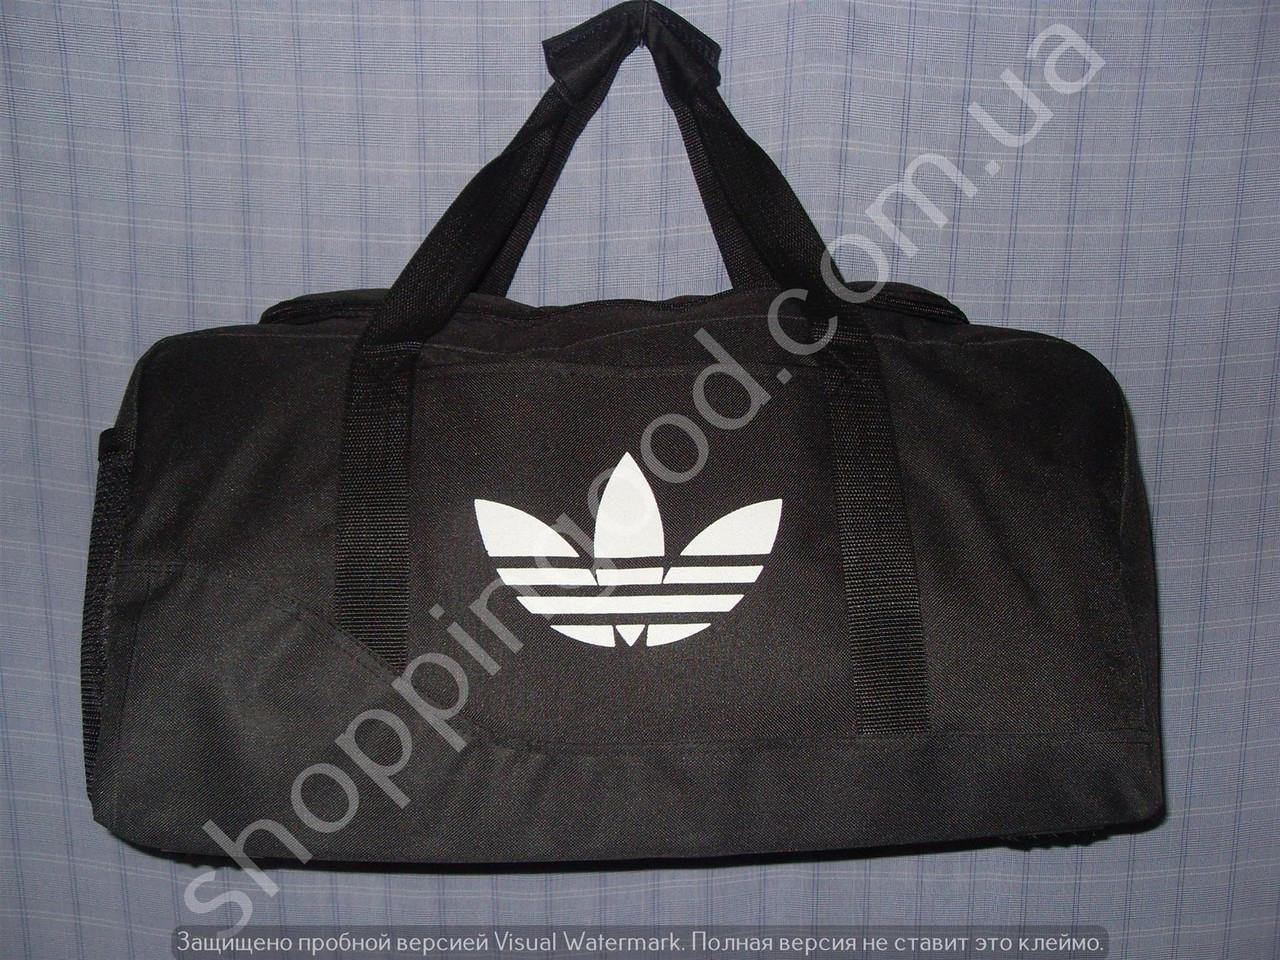 73b4cf9b826d Дорожная сумка Adidas 013605 малая (45х24х20, см) черная спортивная багажная  текстиль копия -